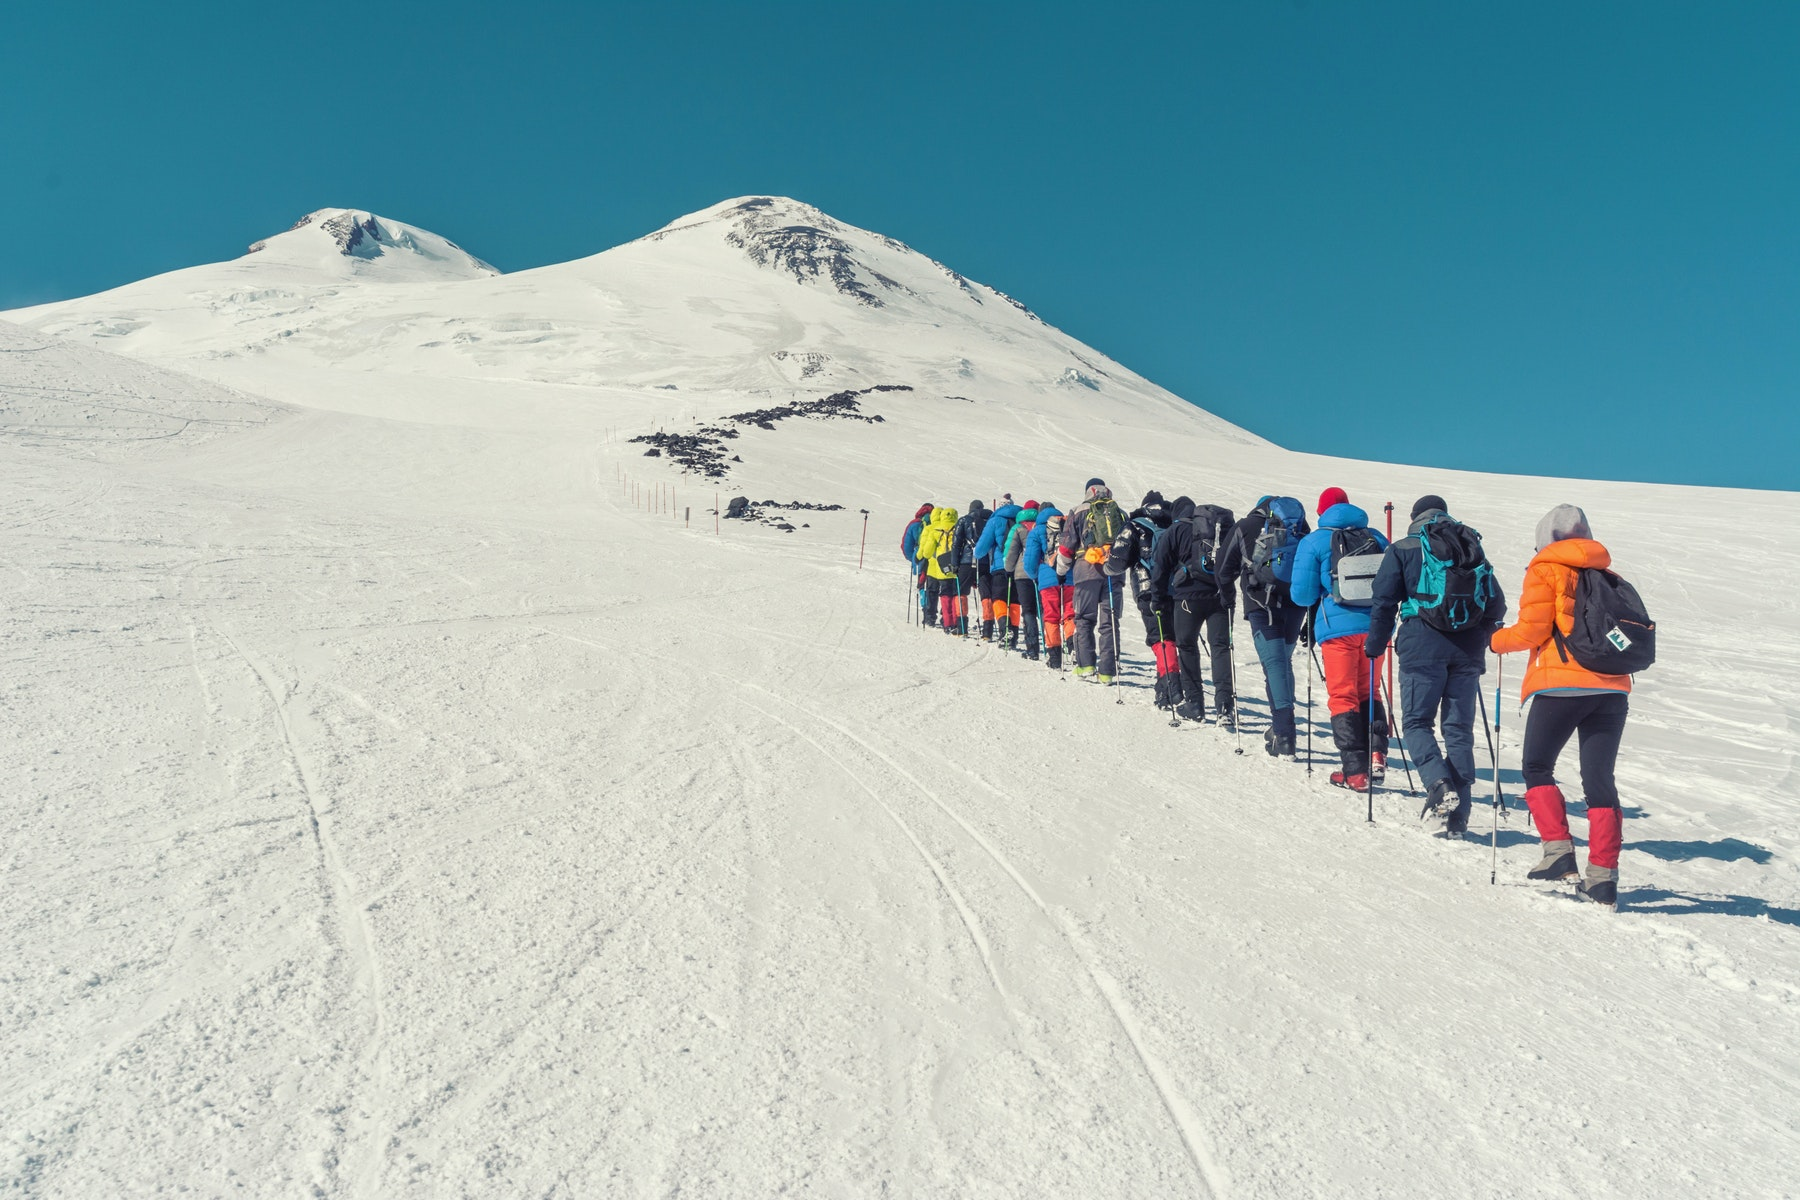 Group of climbers on Mt Elbrus